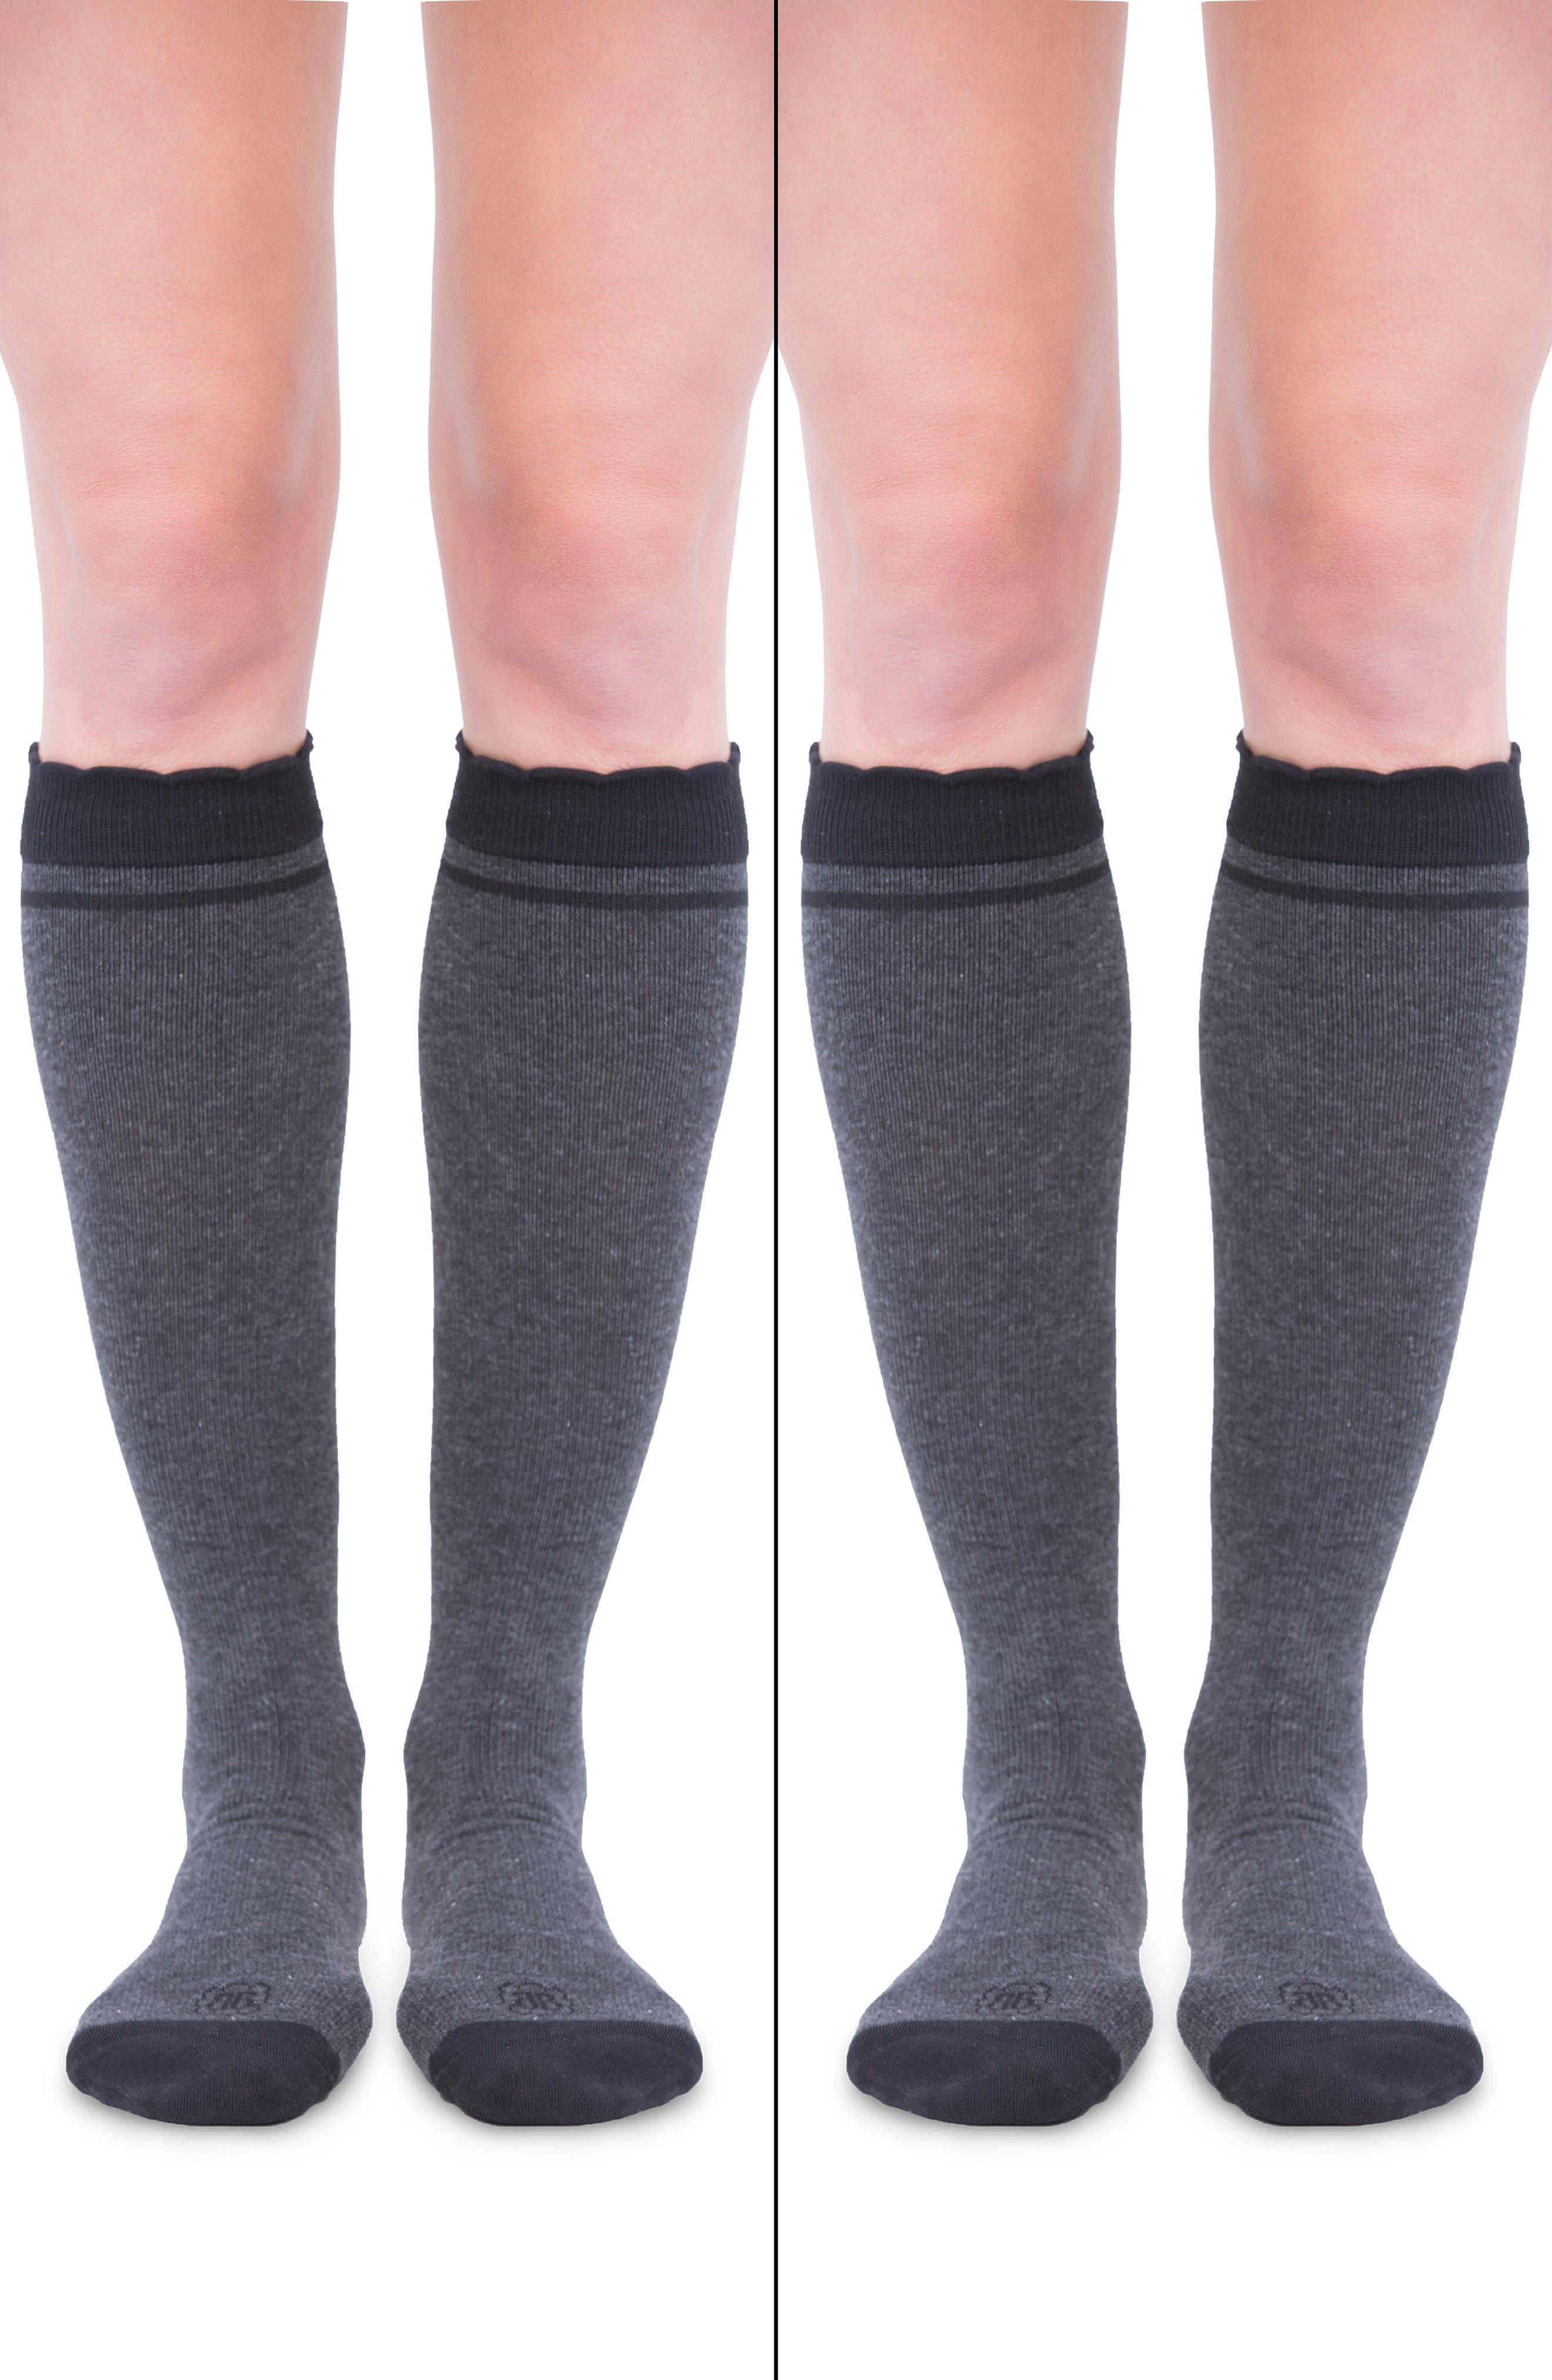 Women's Belly Bandit 2-Pack Compression Socks